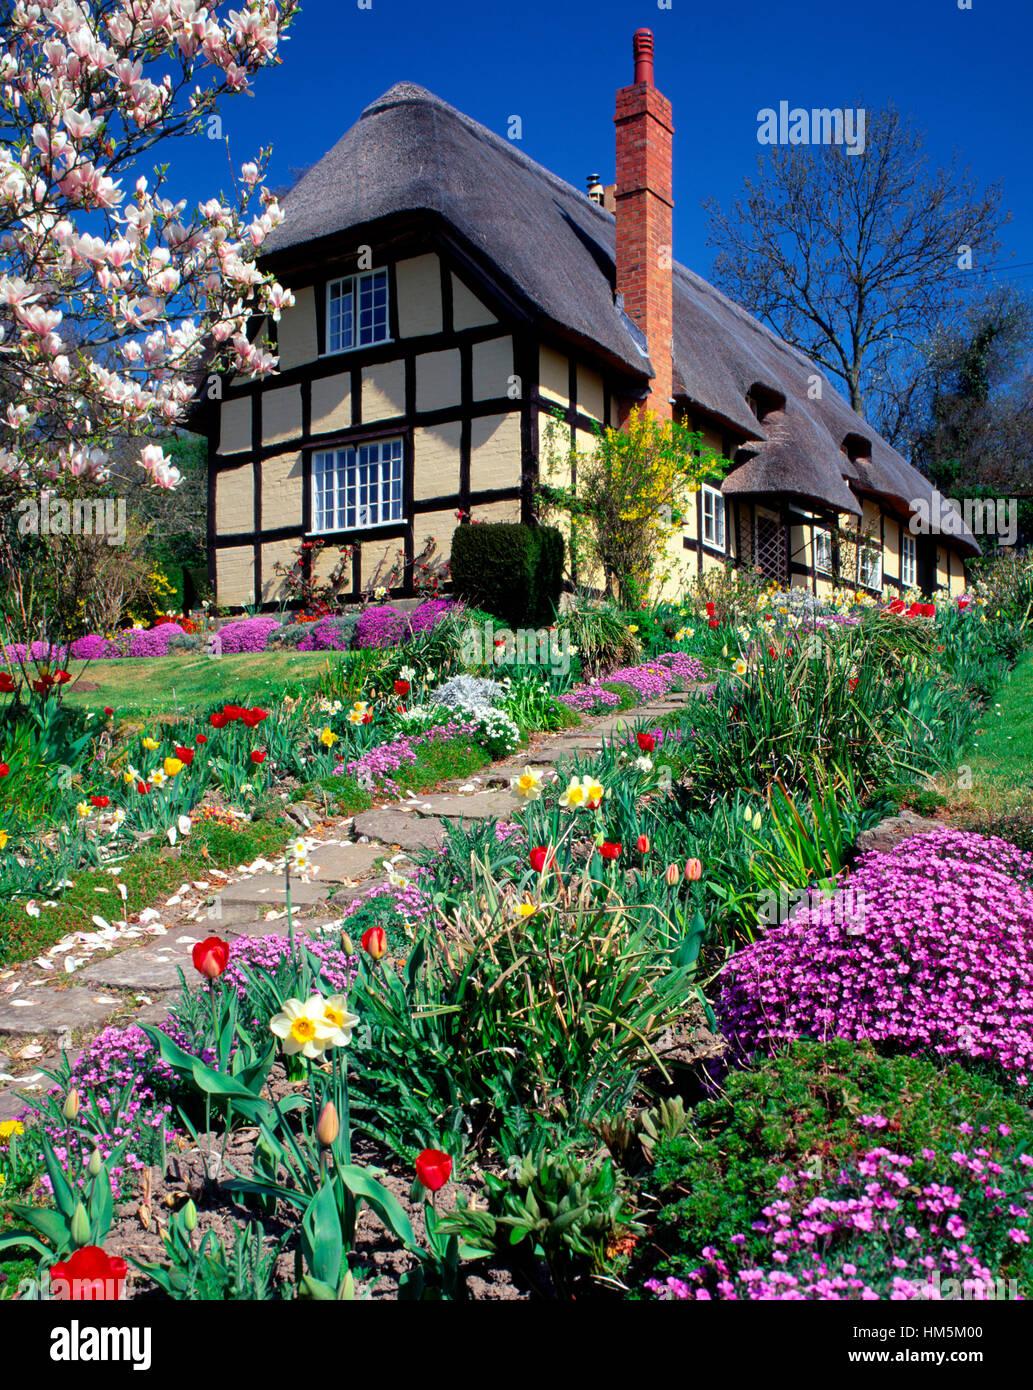 Thatched and timbered cottage with Spring flowers near Ledbury, Herefordshire, England, UK - Stock Image